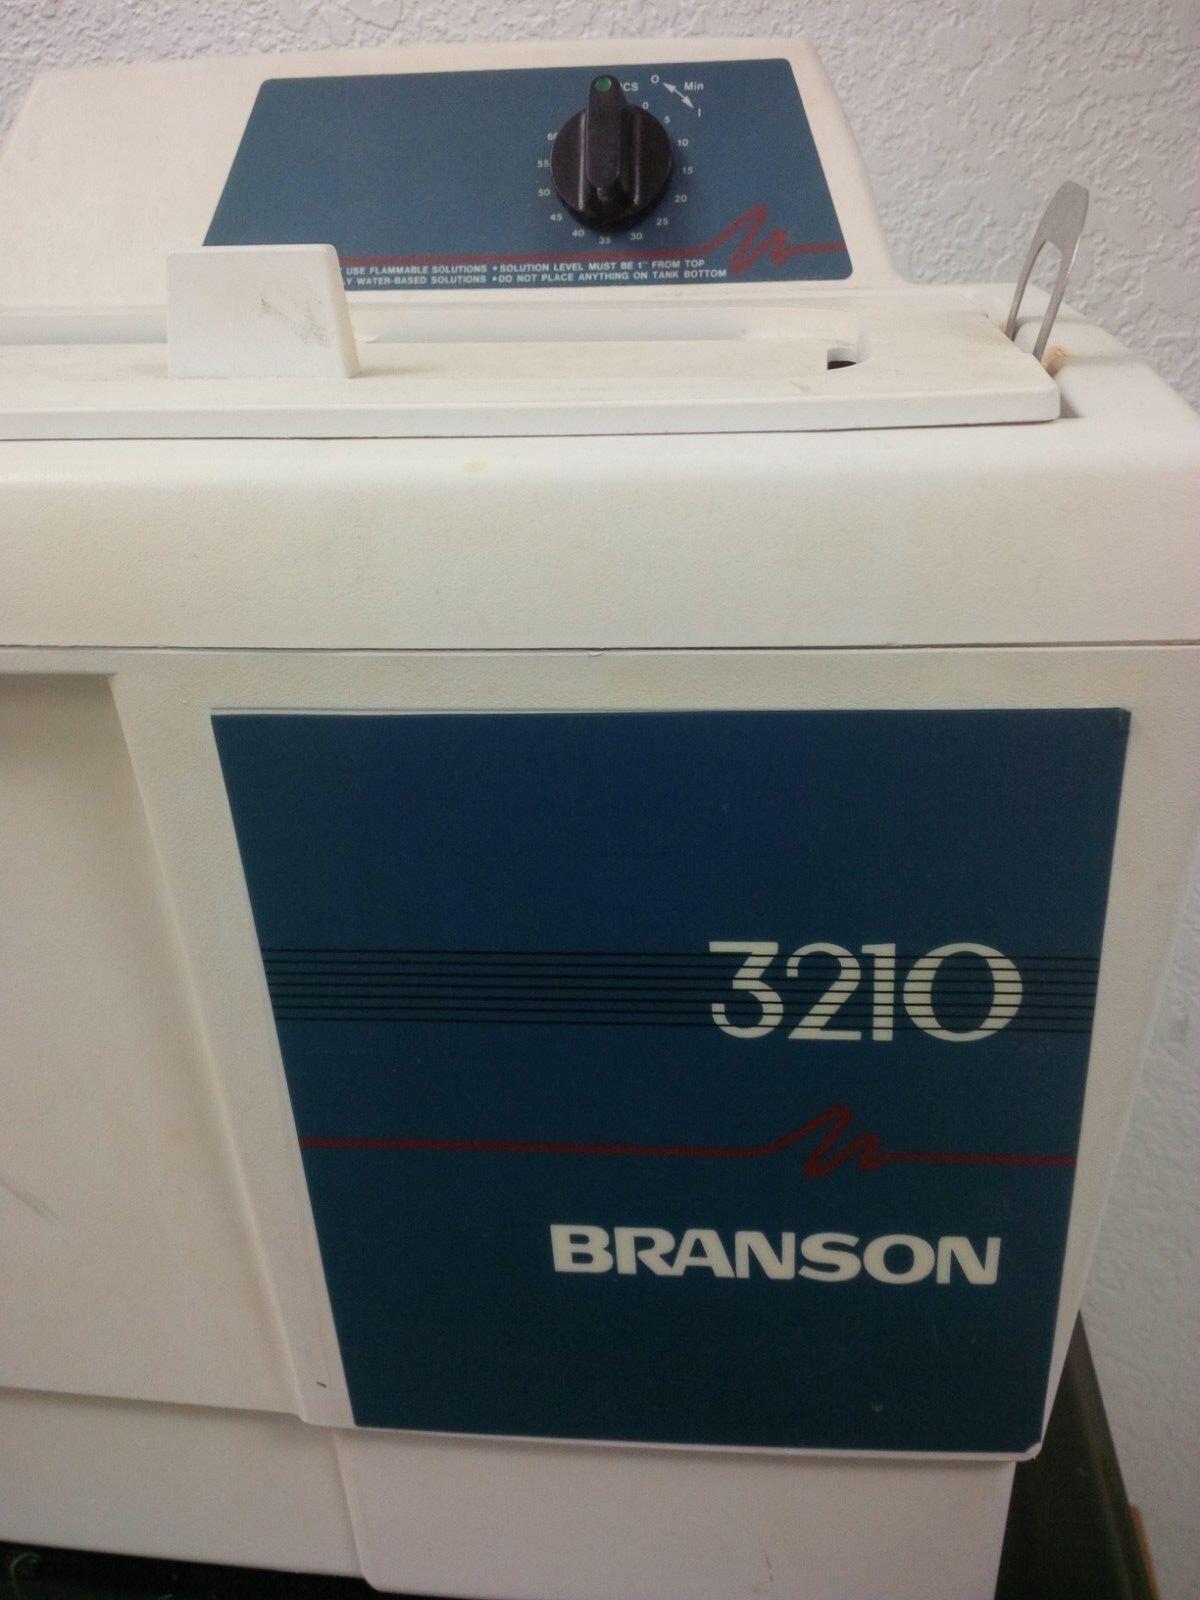 Branson 3210 Ultrasonic Cleaner MIAMI 1